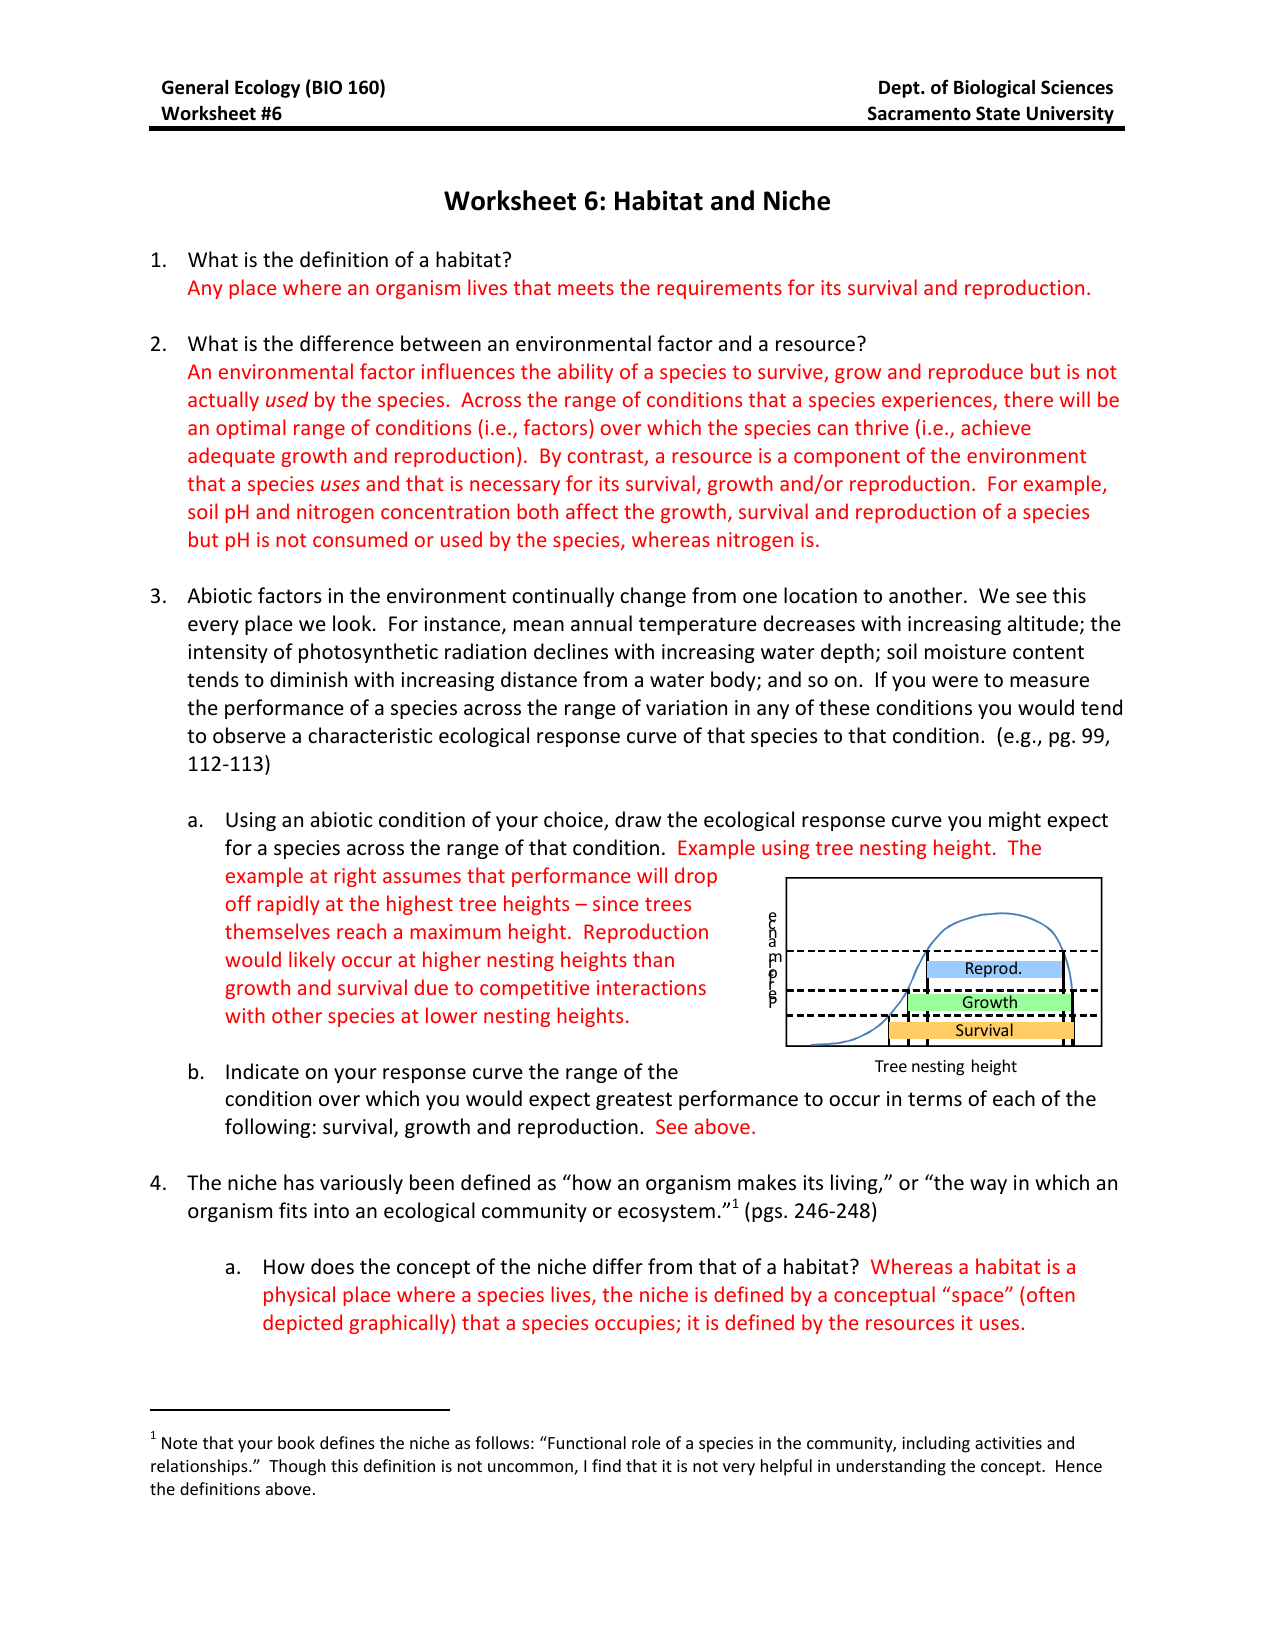 Worksheet 6: Habitat and Niche